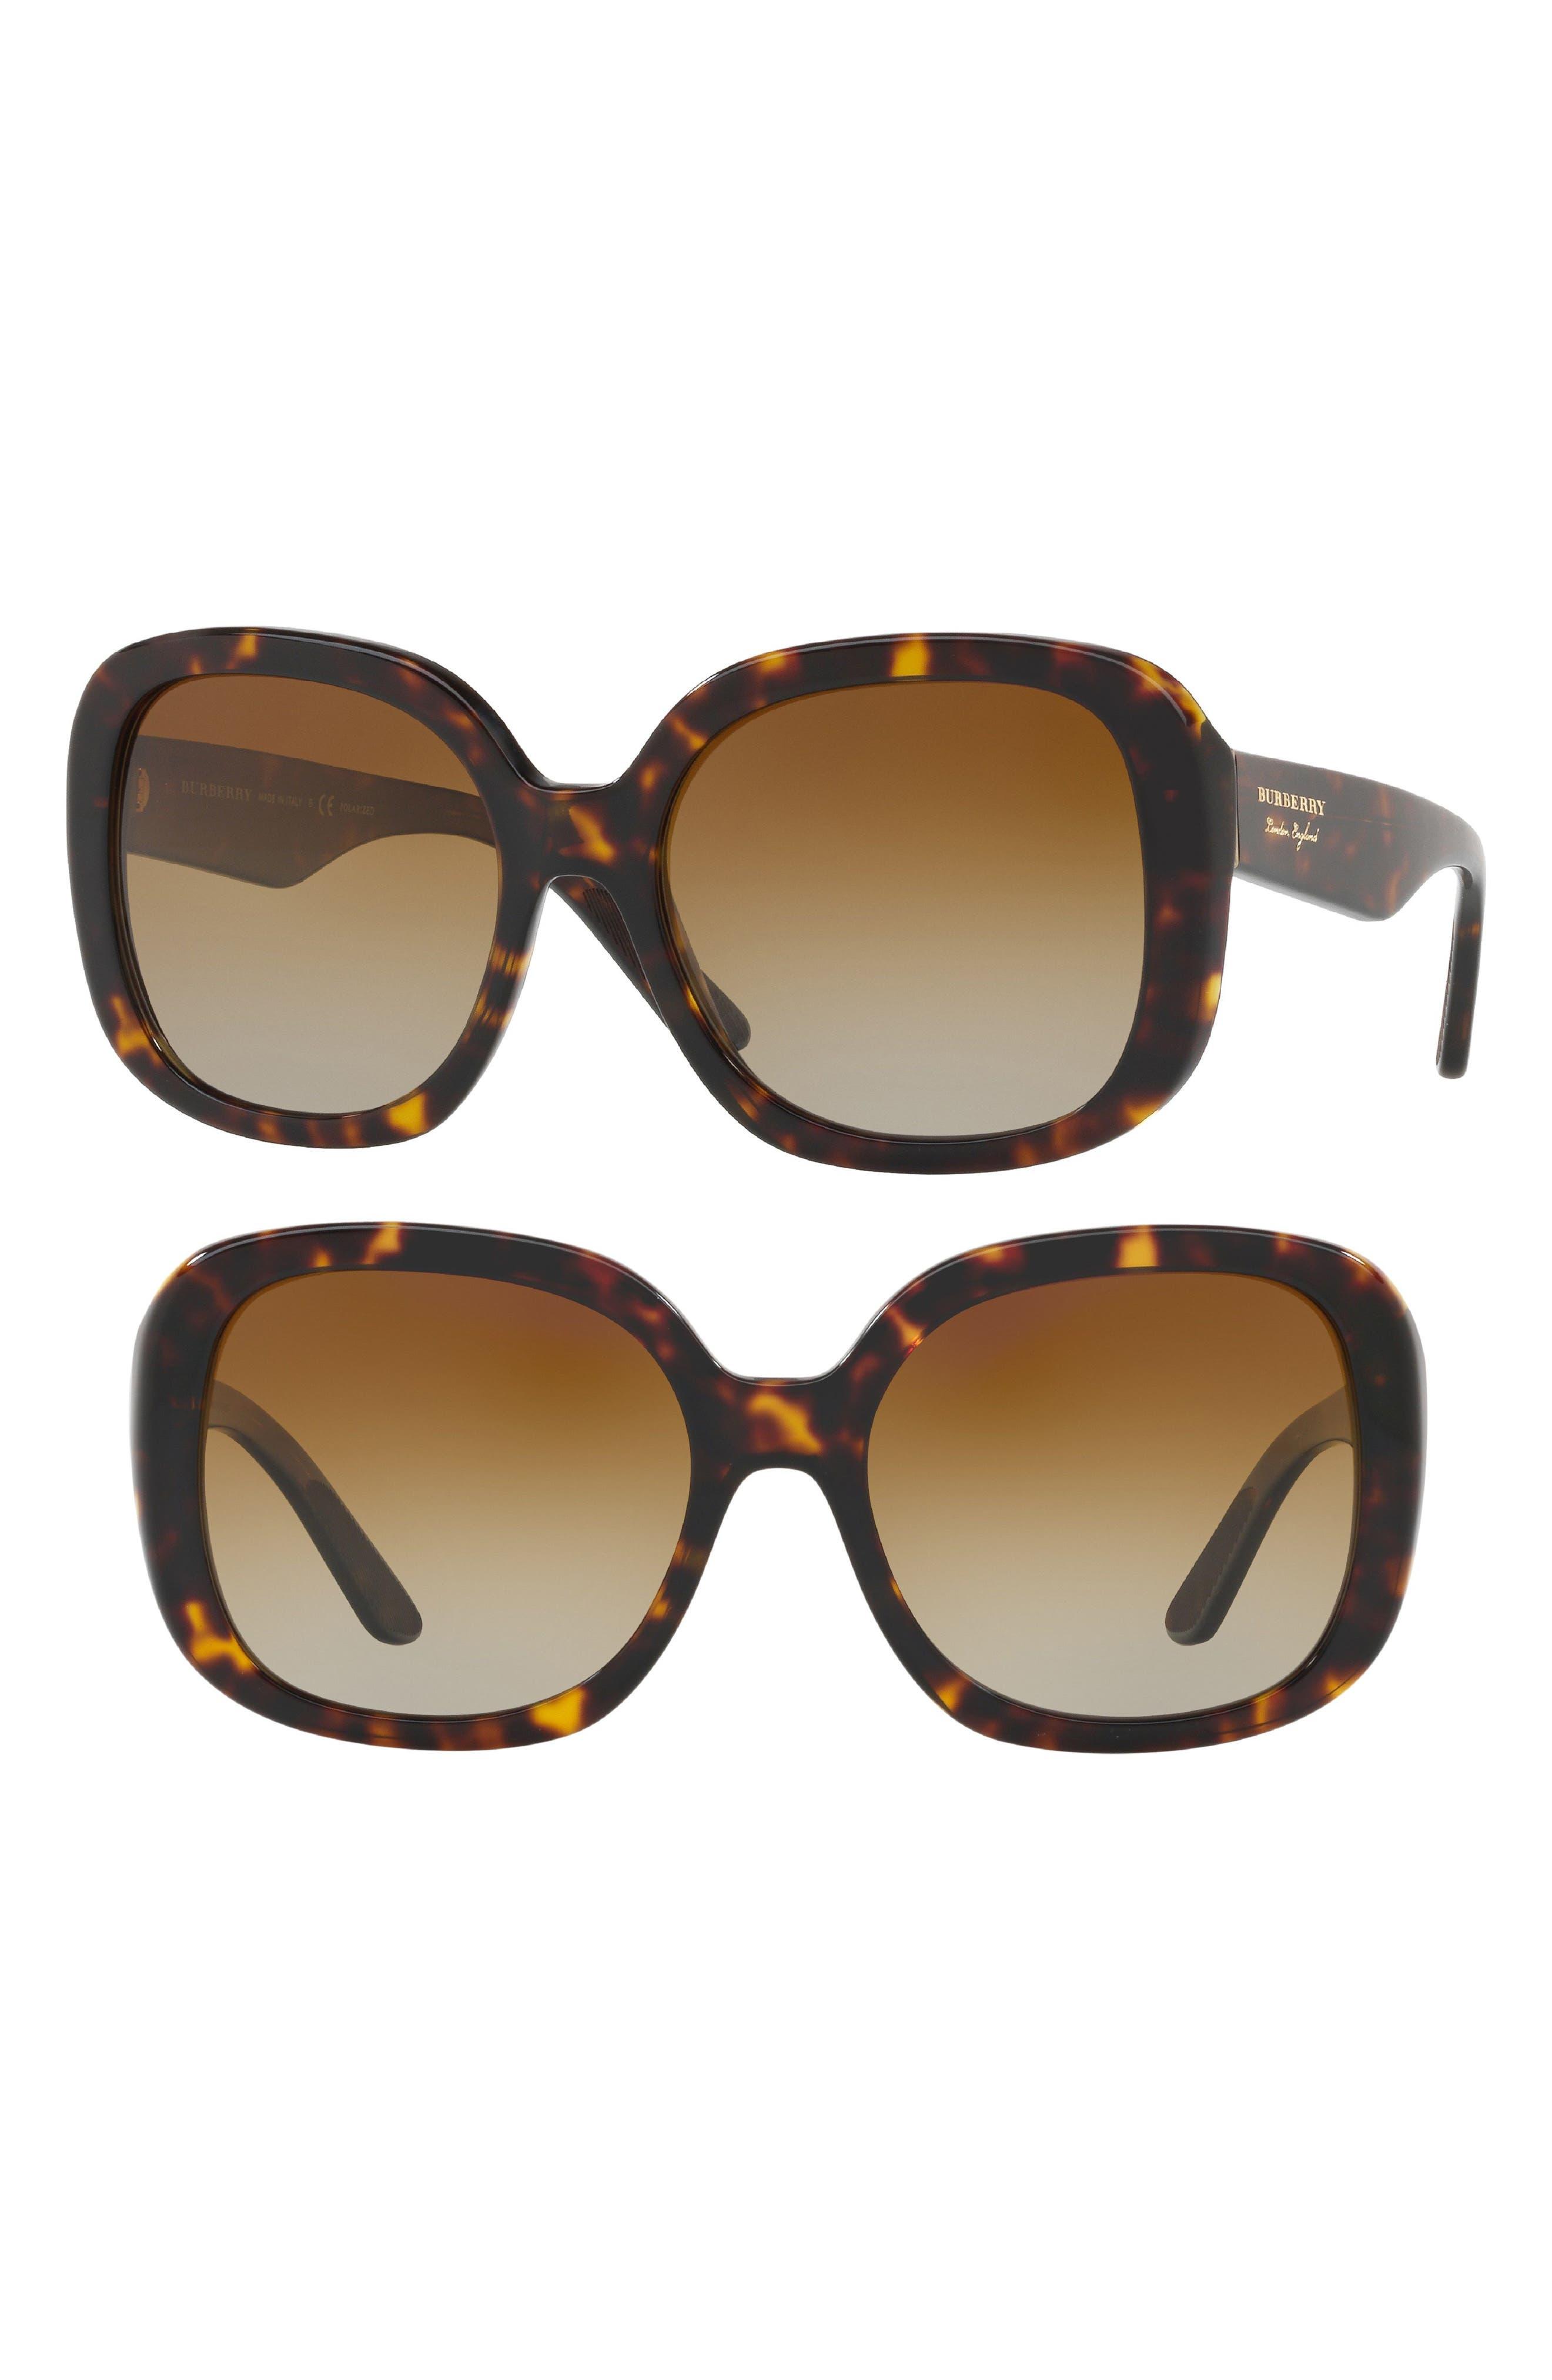 Burberry 56mm Polarized Sunglasses